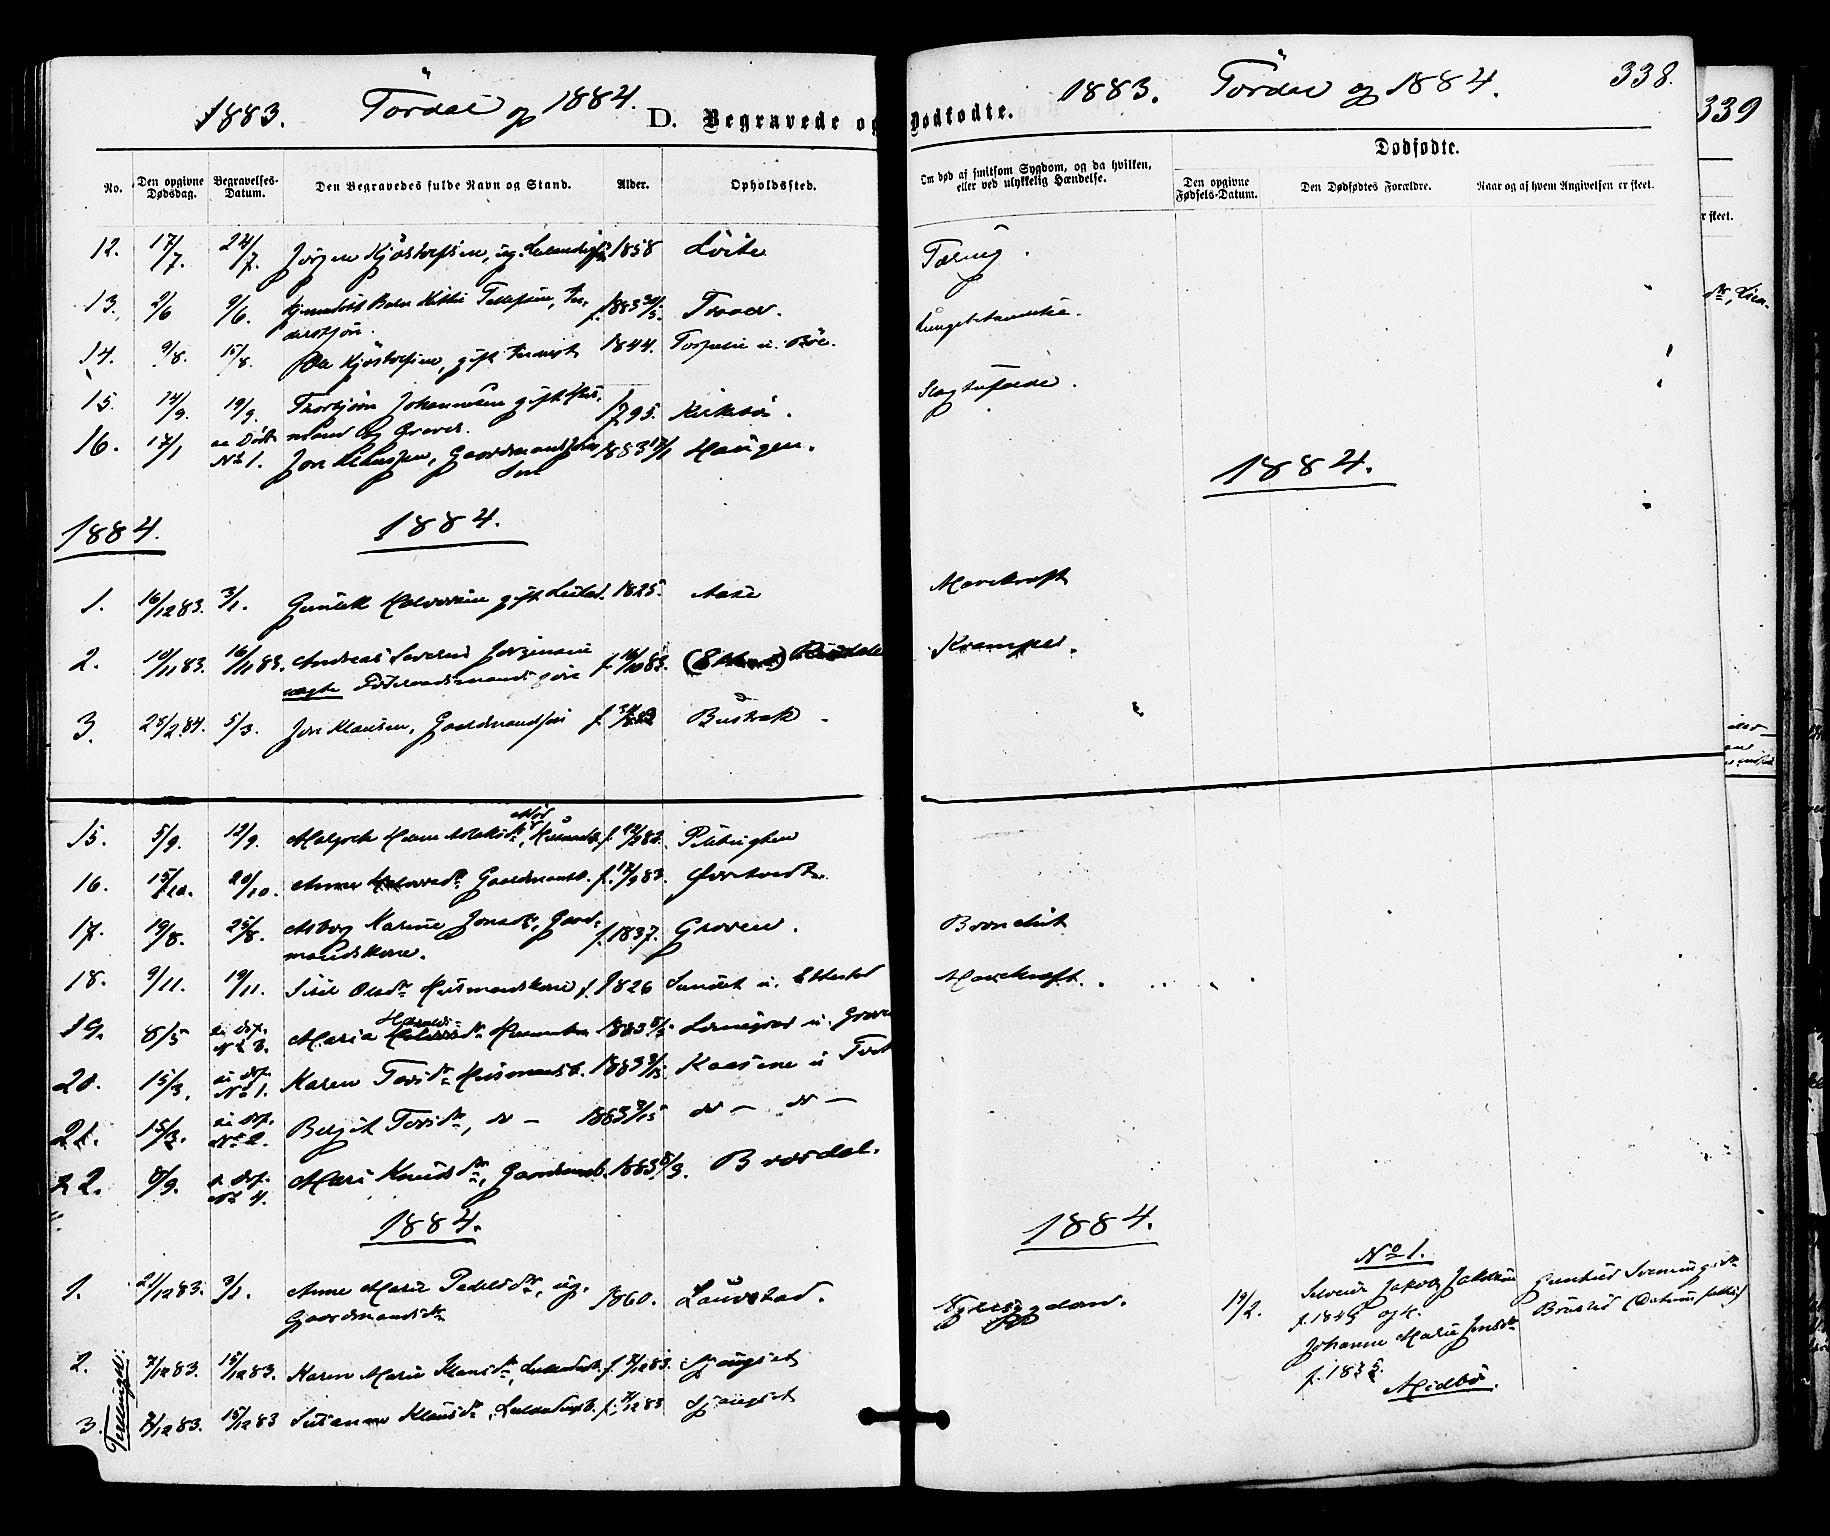 SAKO, Drangedal kirkebøker, F/Fa/L0009: Ministerialbok nr. 9 /2, 1872-1884, s. 338